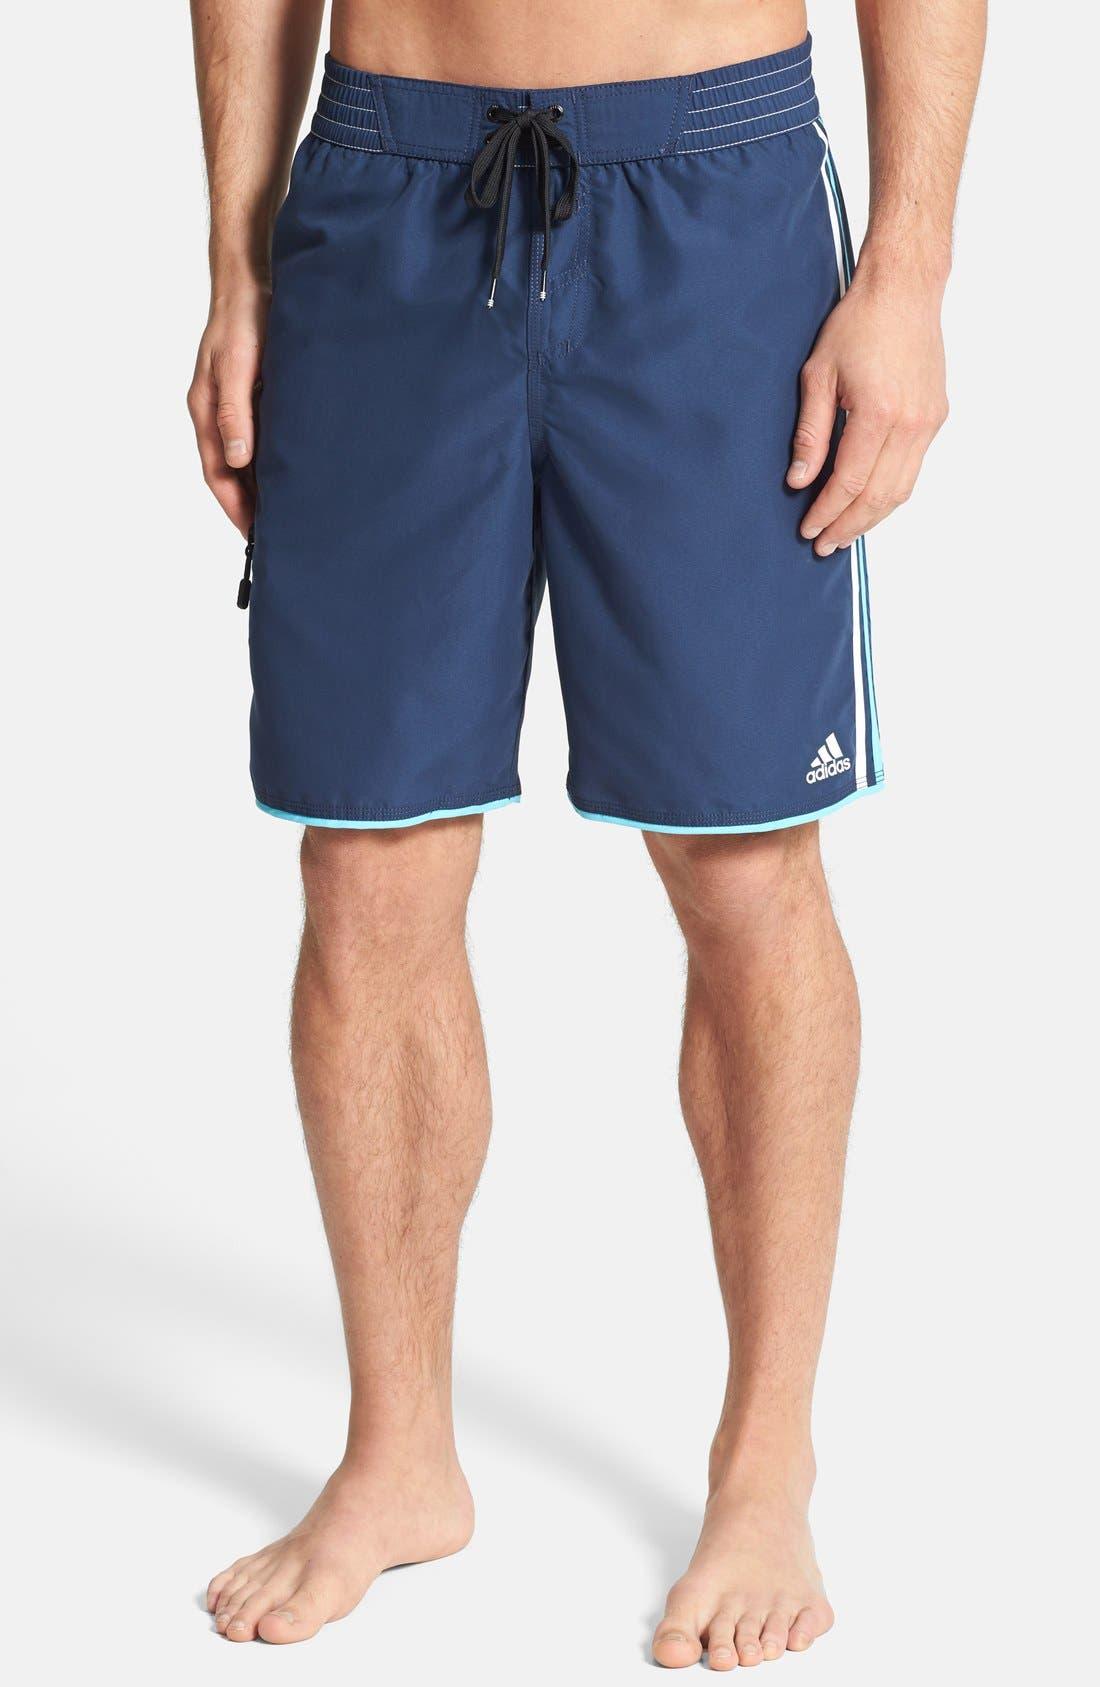 Alternate Image 1 Selected - adidas 'Core' Swim Trunks